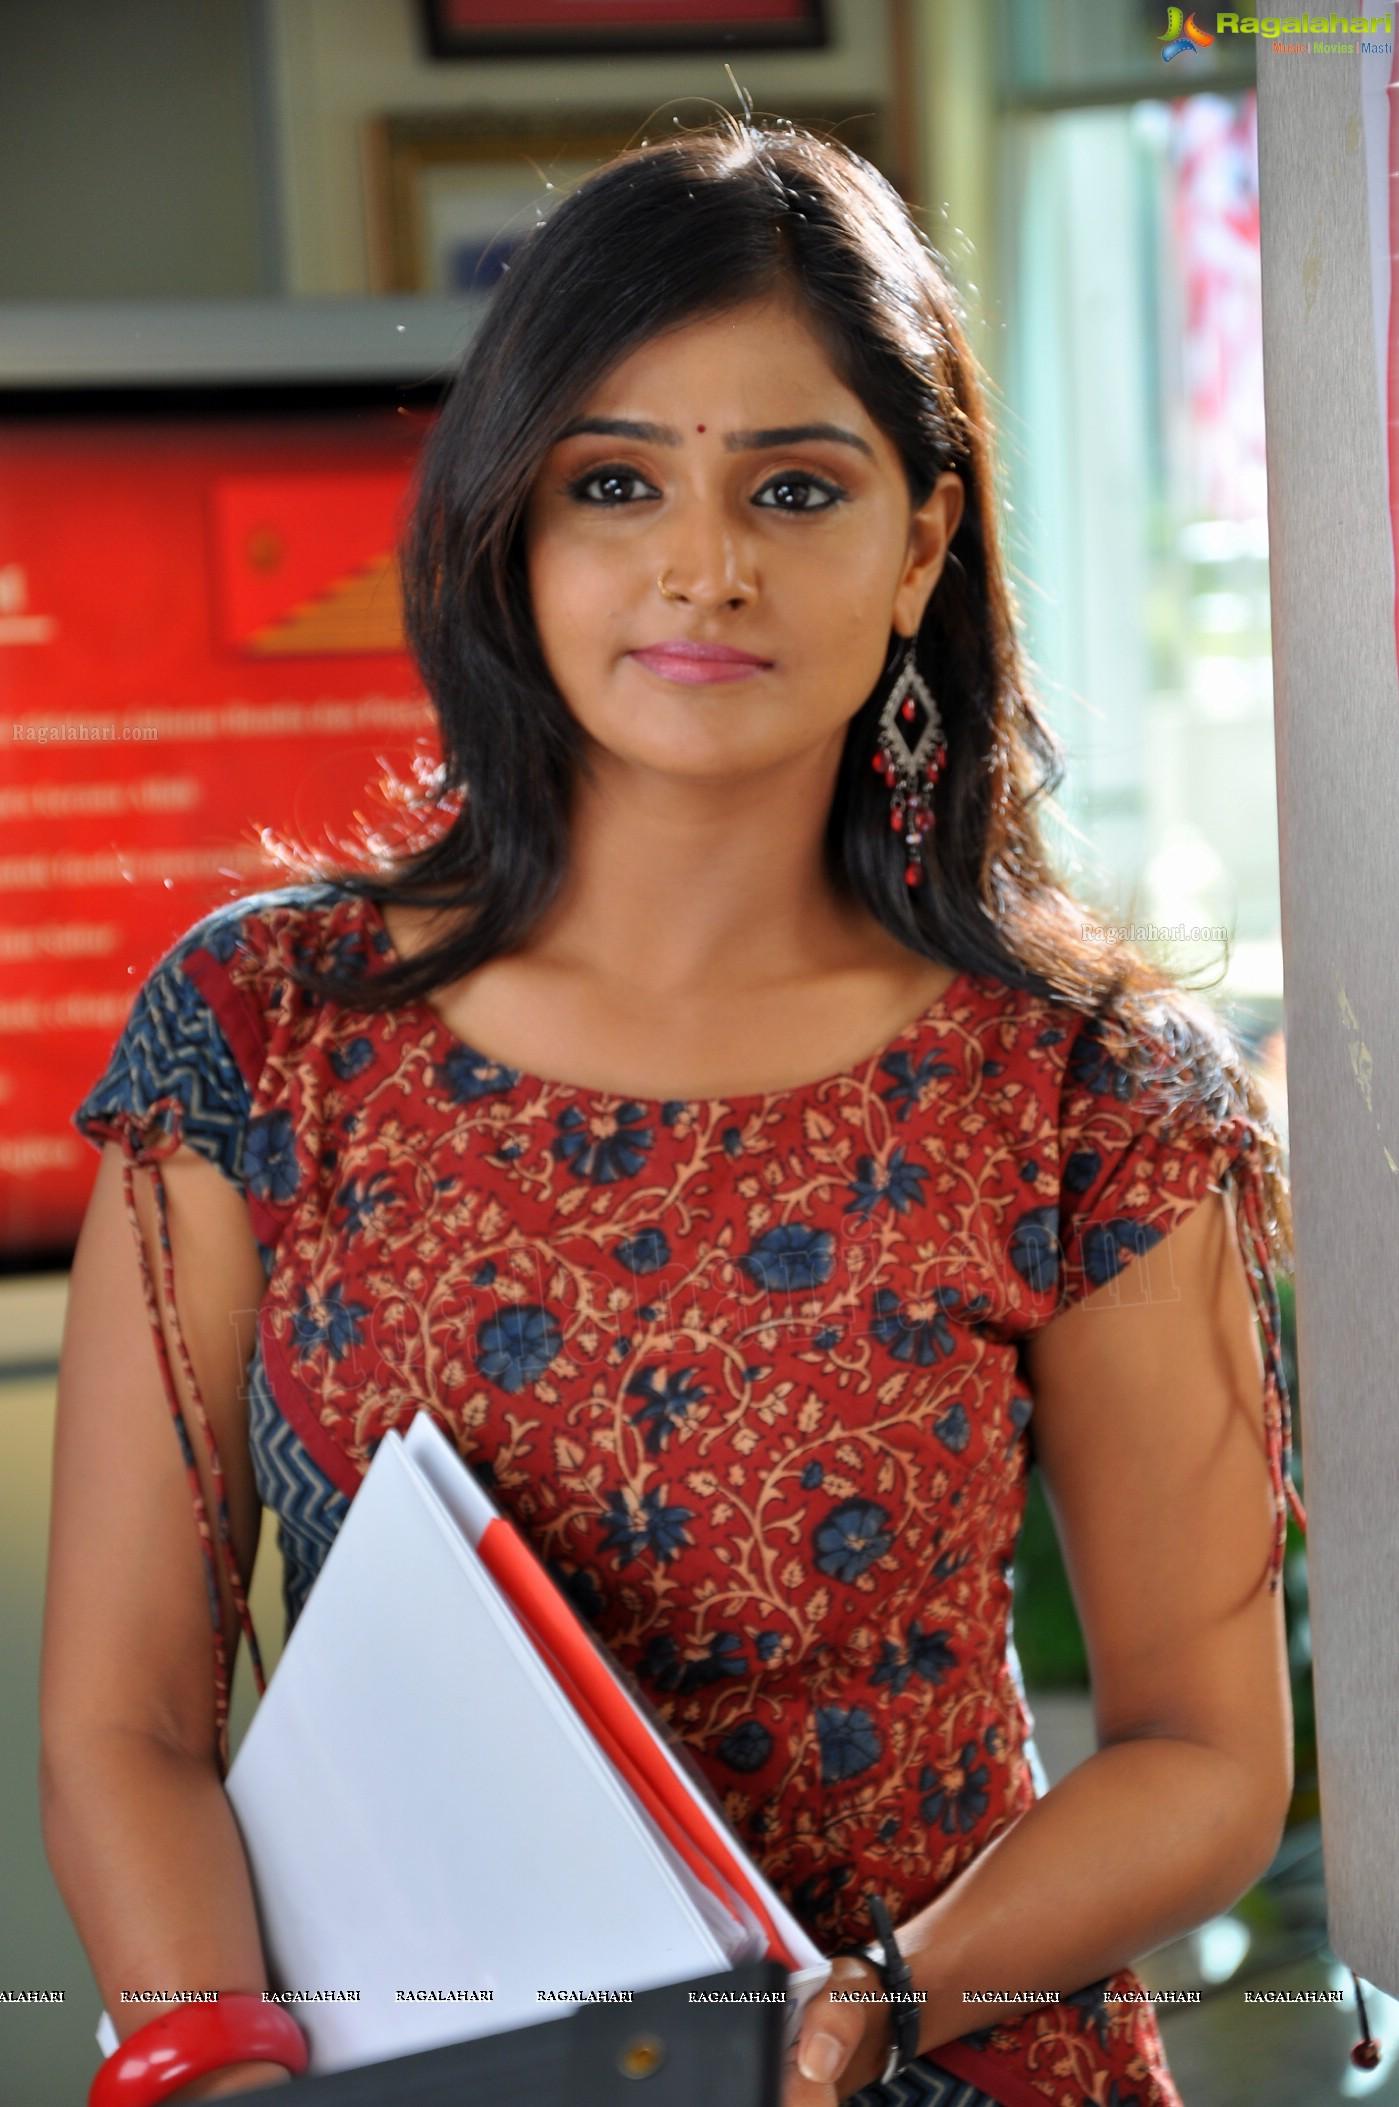 remya nambeesan (posters) image 33 | telugu actress images,images